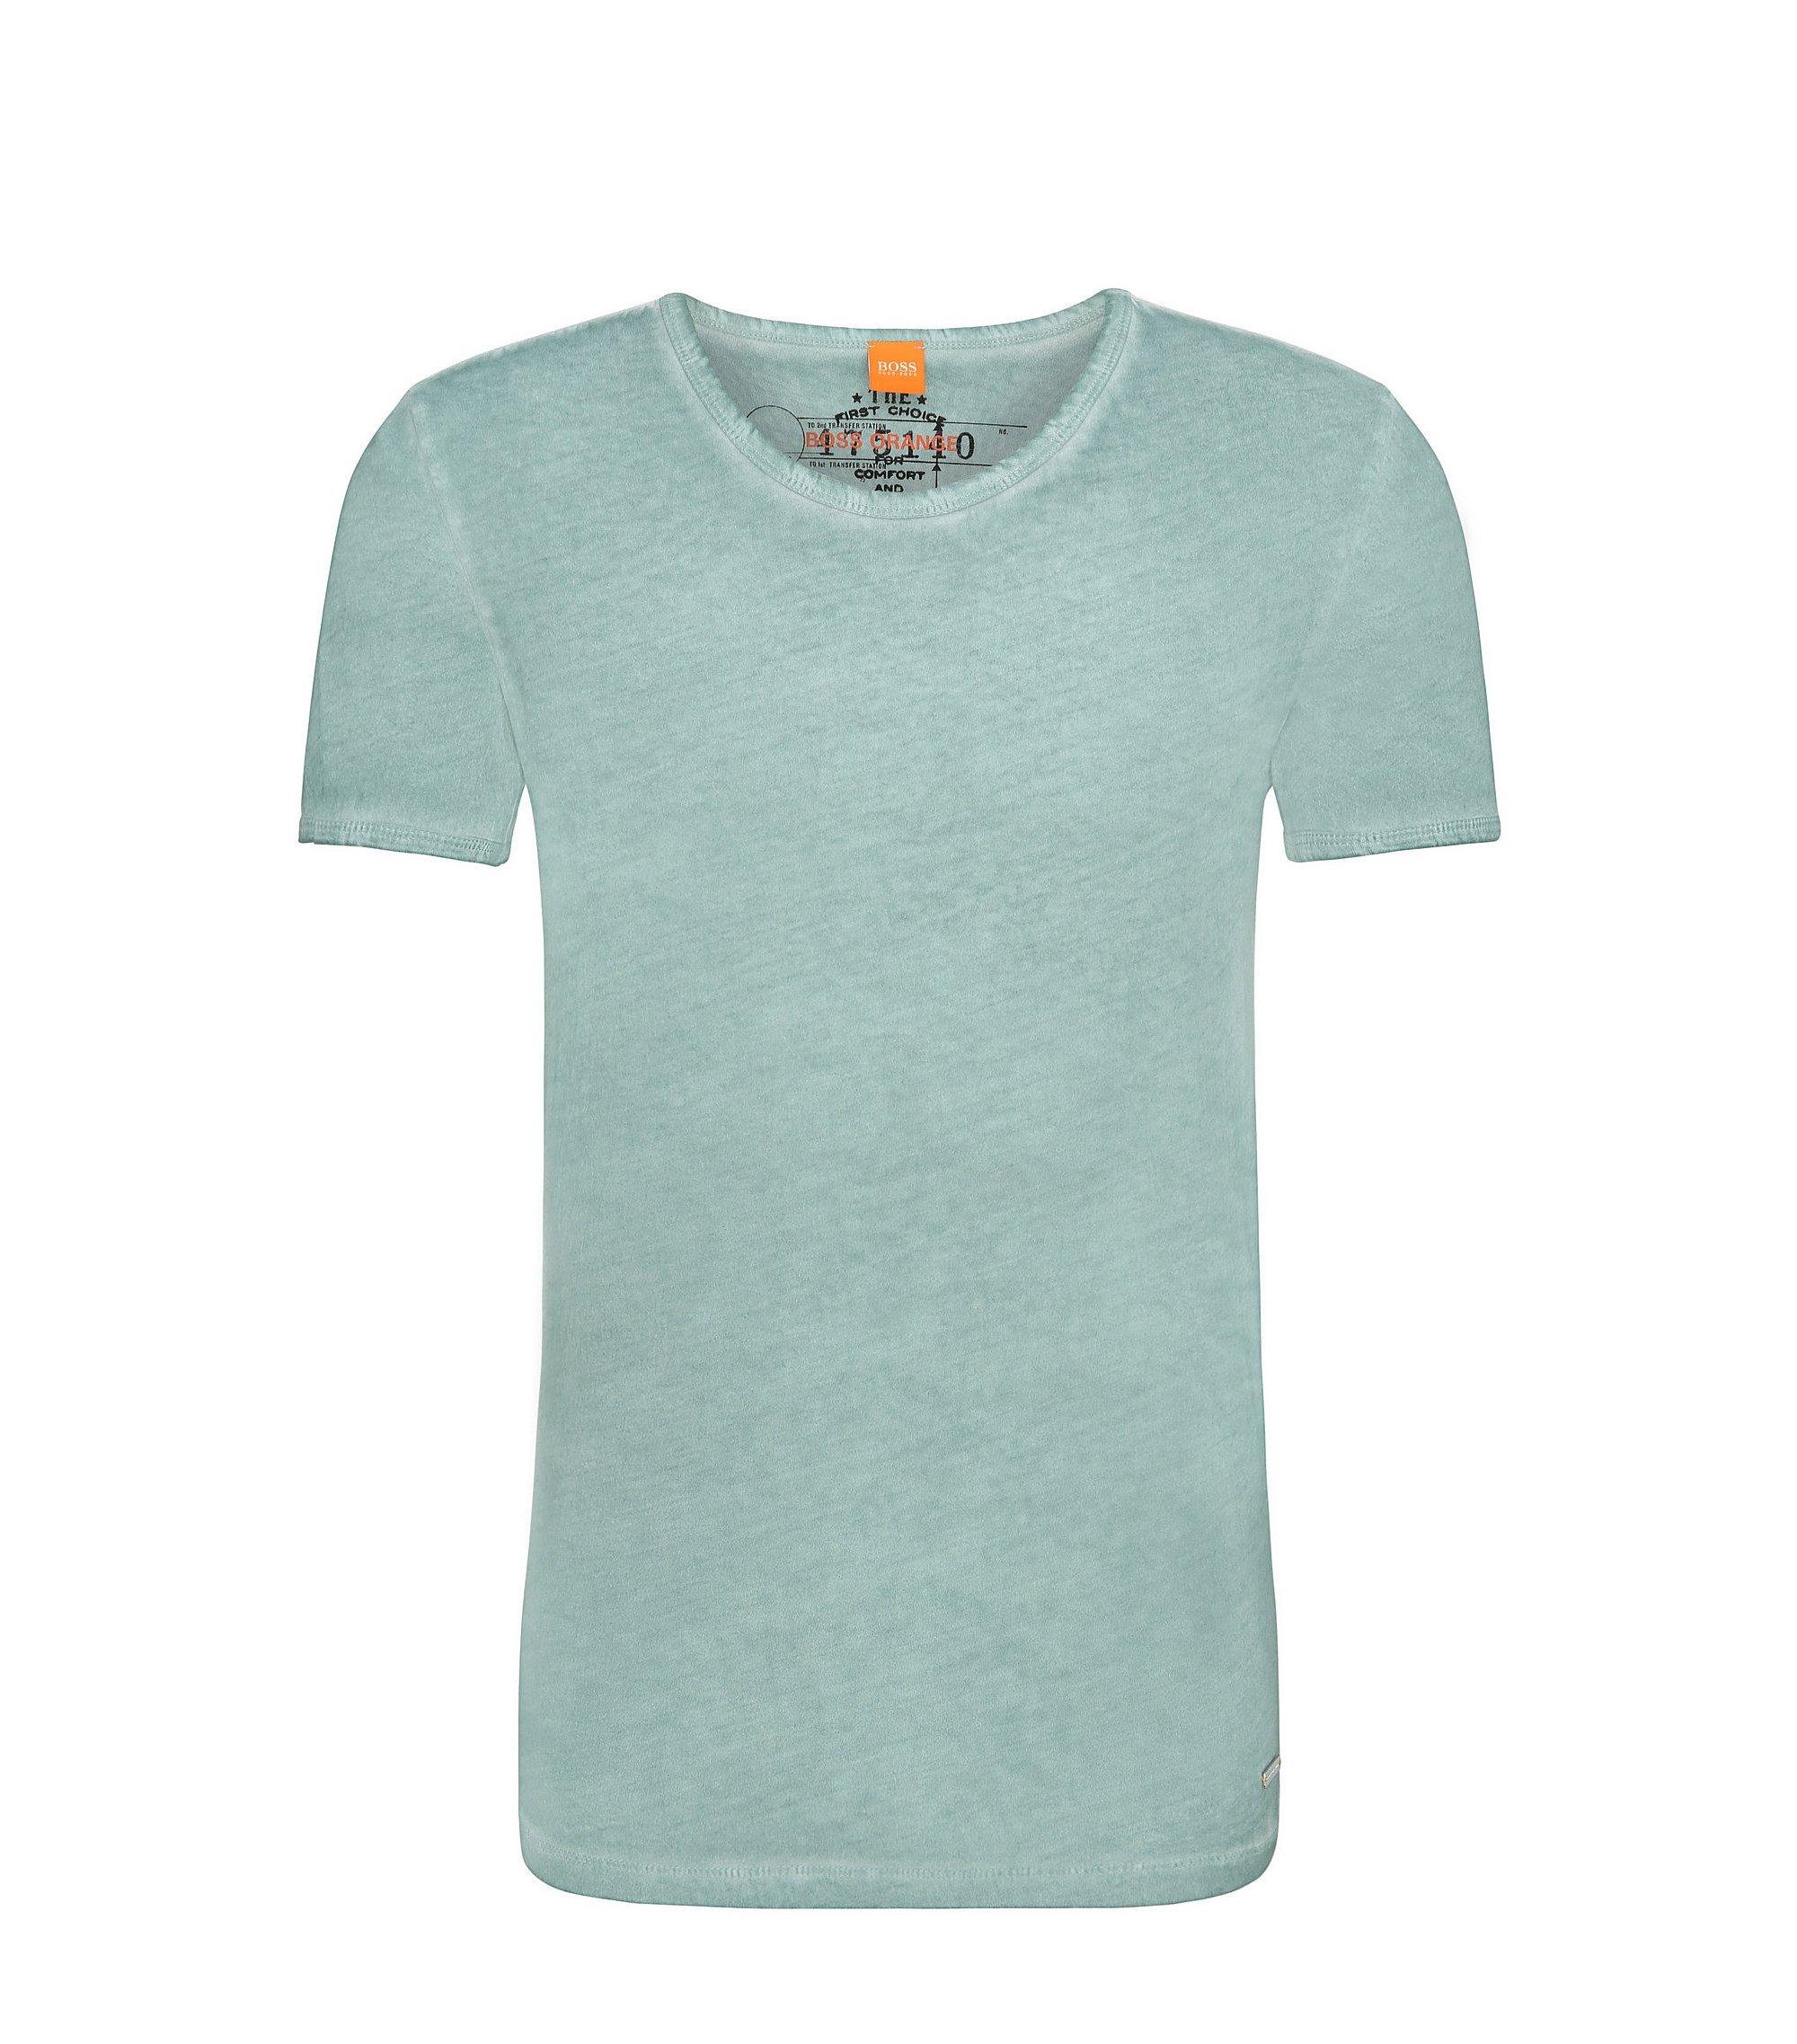 Cotton Garment Washed T-Shirt | Tour, Turquoise